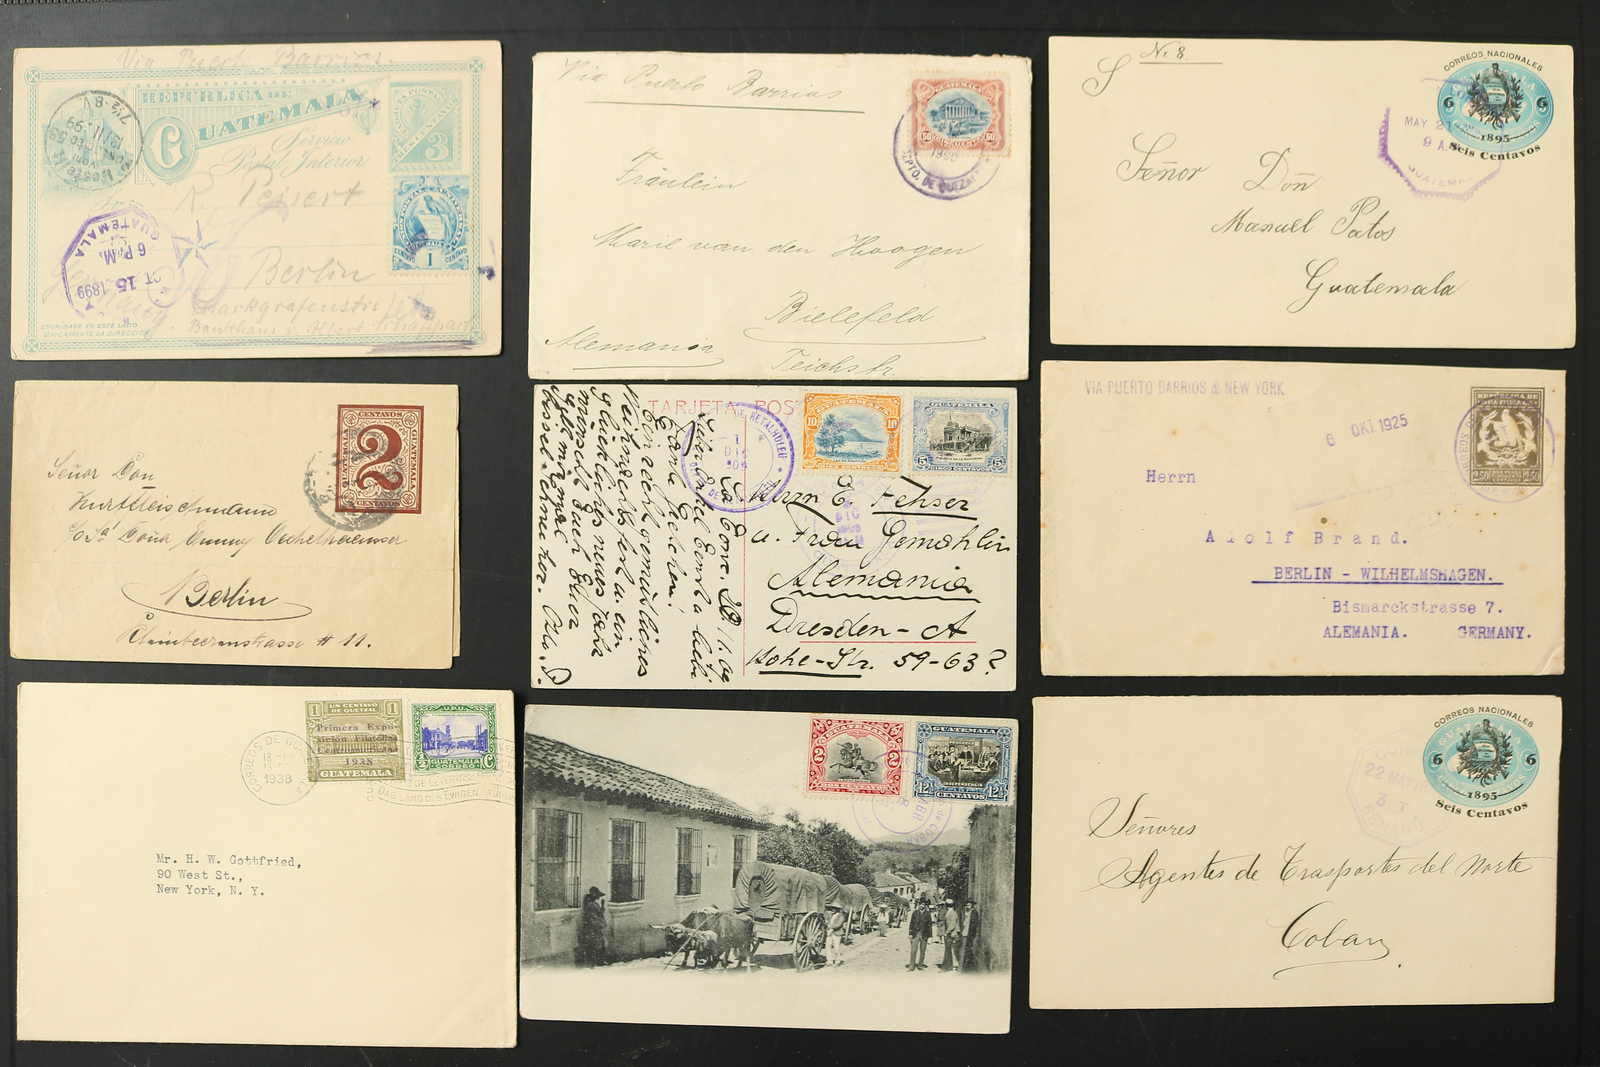 Schlegel Auctions Berlin - Guatemala Covers bulk lot